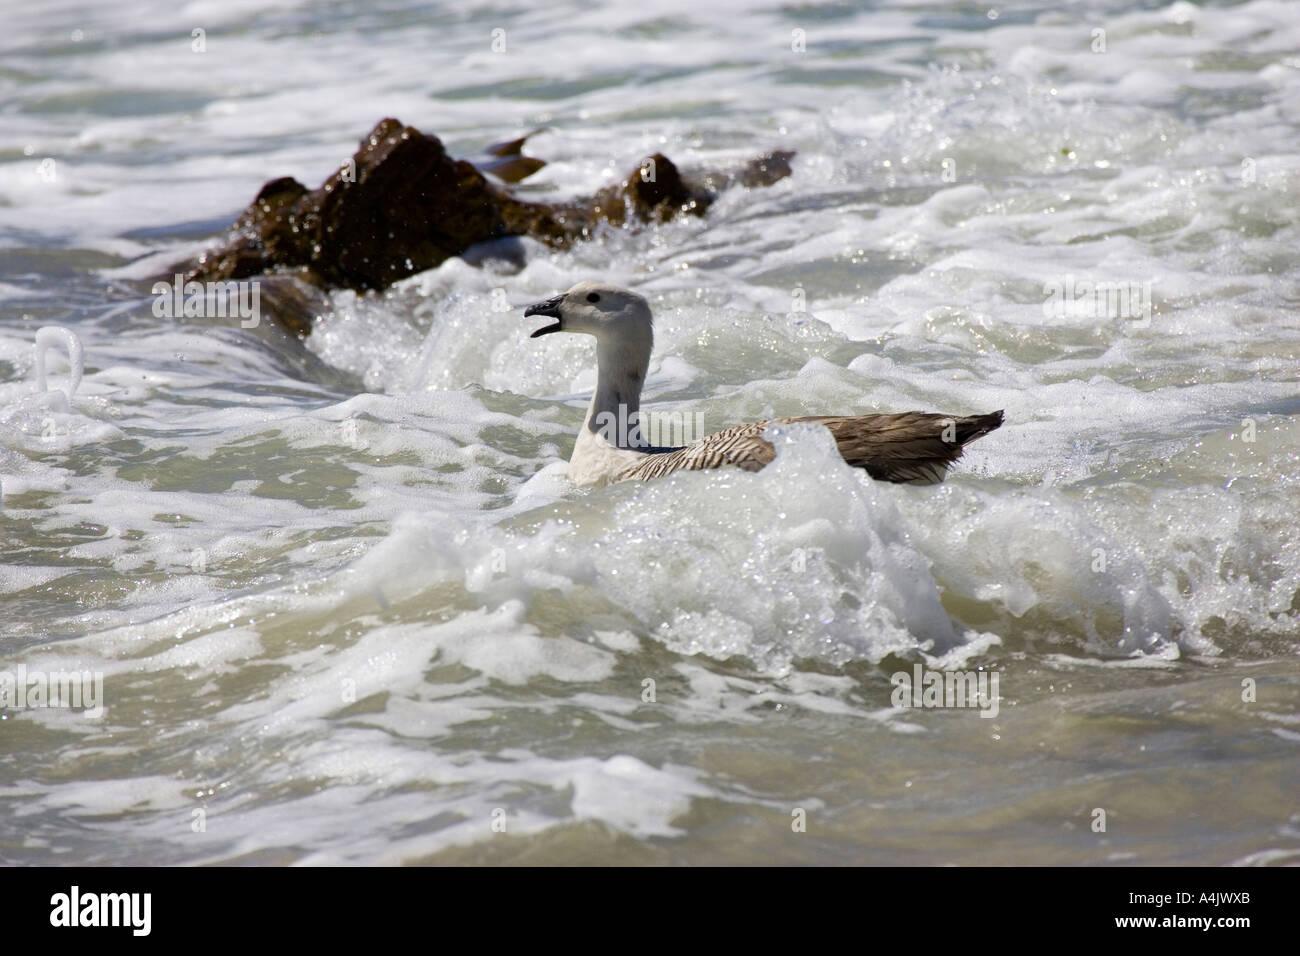 Upland Goose Chloephaga picta male swimming in suff - Stock Image